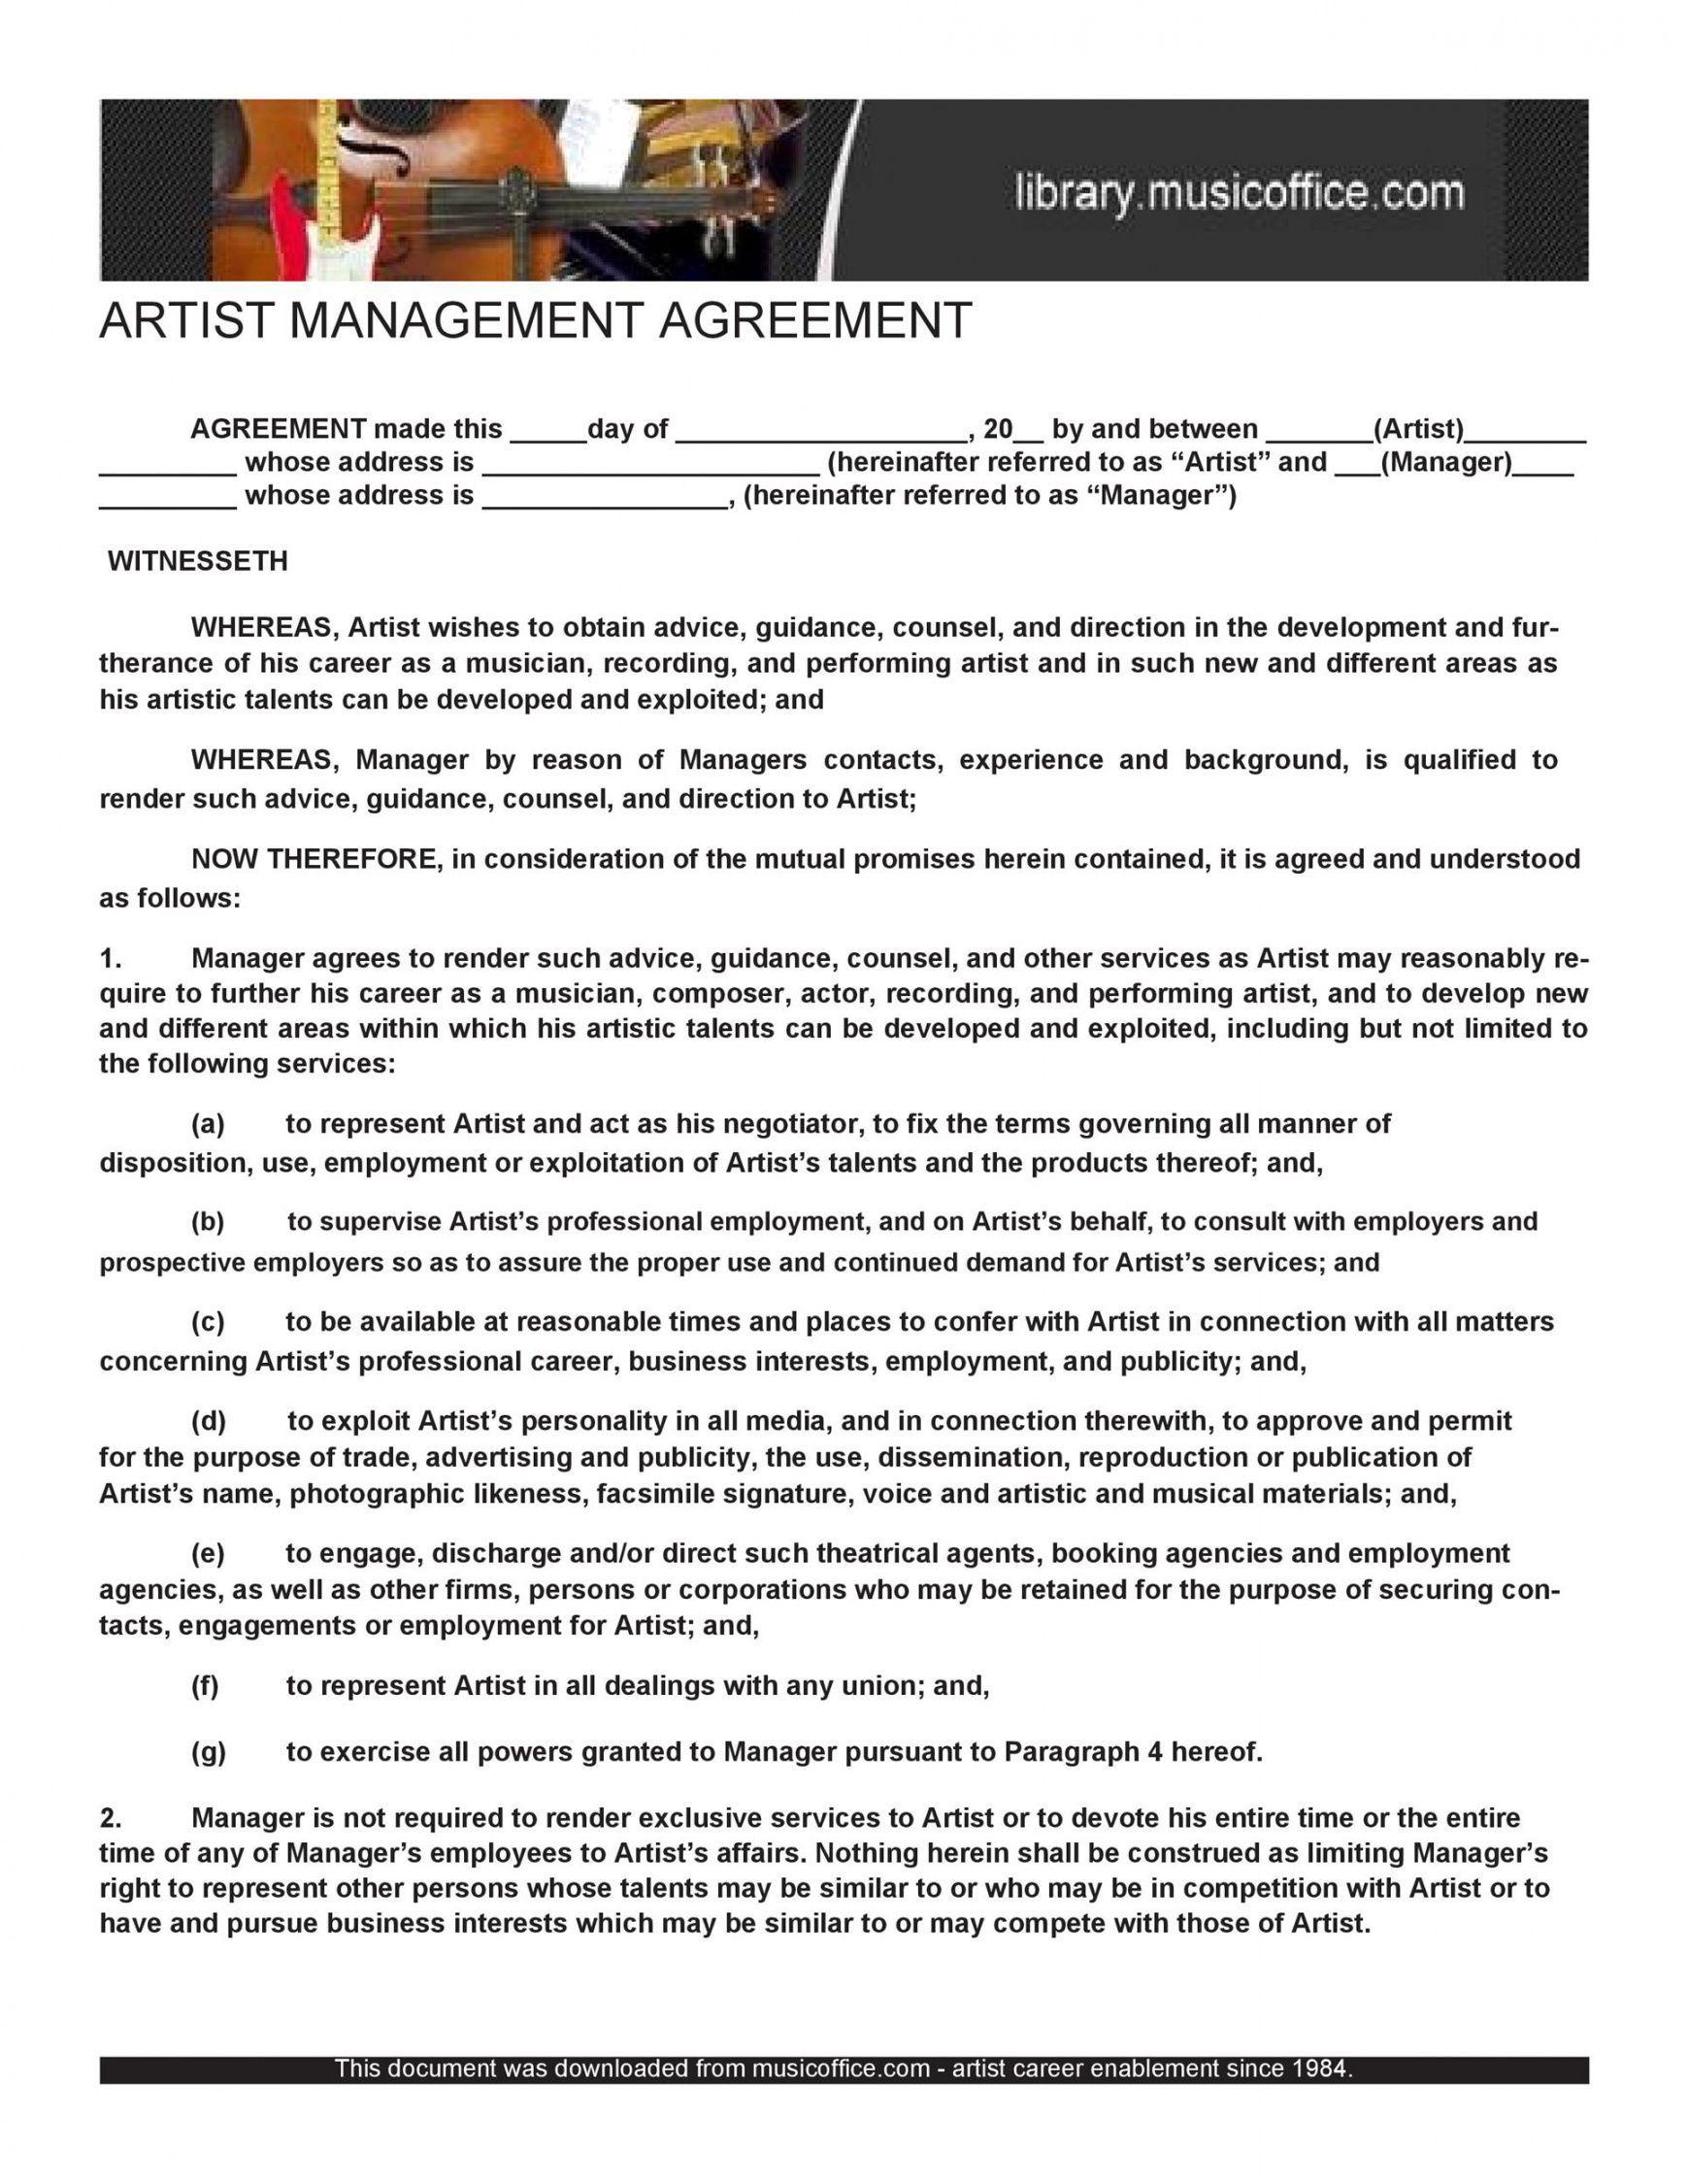 Best Art Commission Contract Template Pdf Example In 2021 Contract Template Math Lesson Plans Template Artist Management